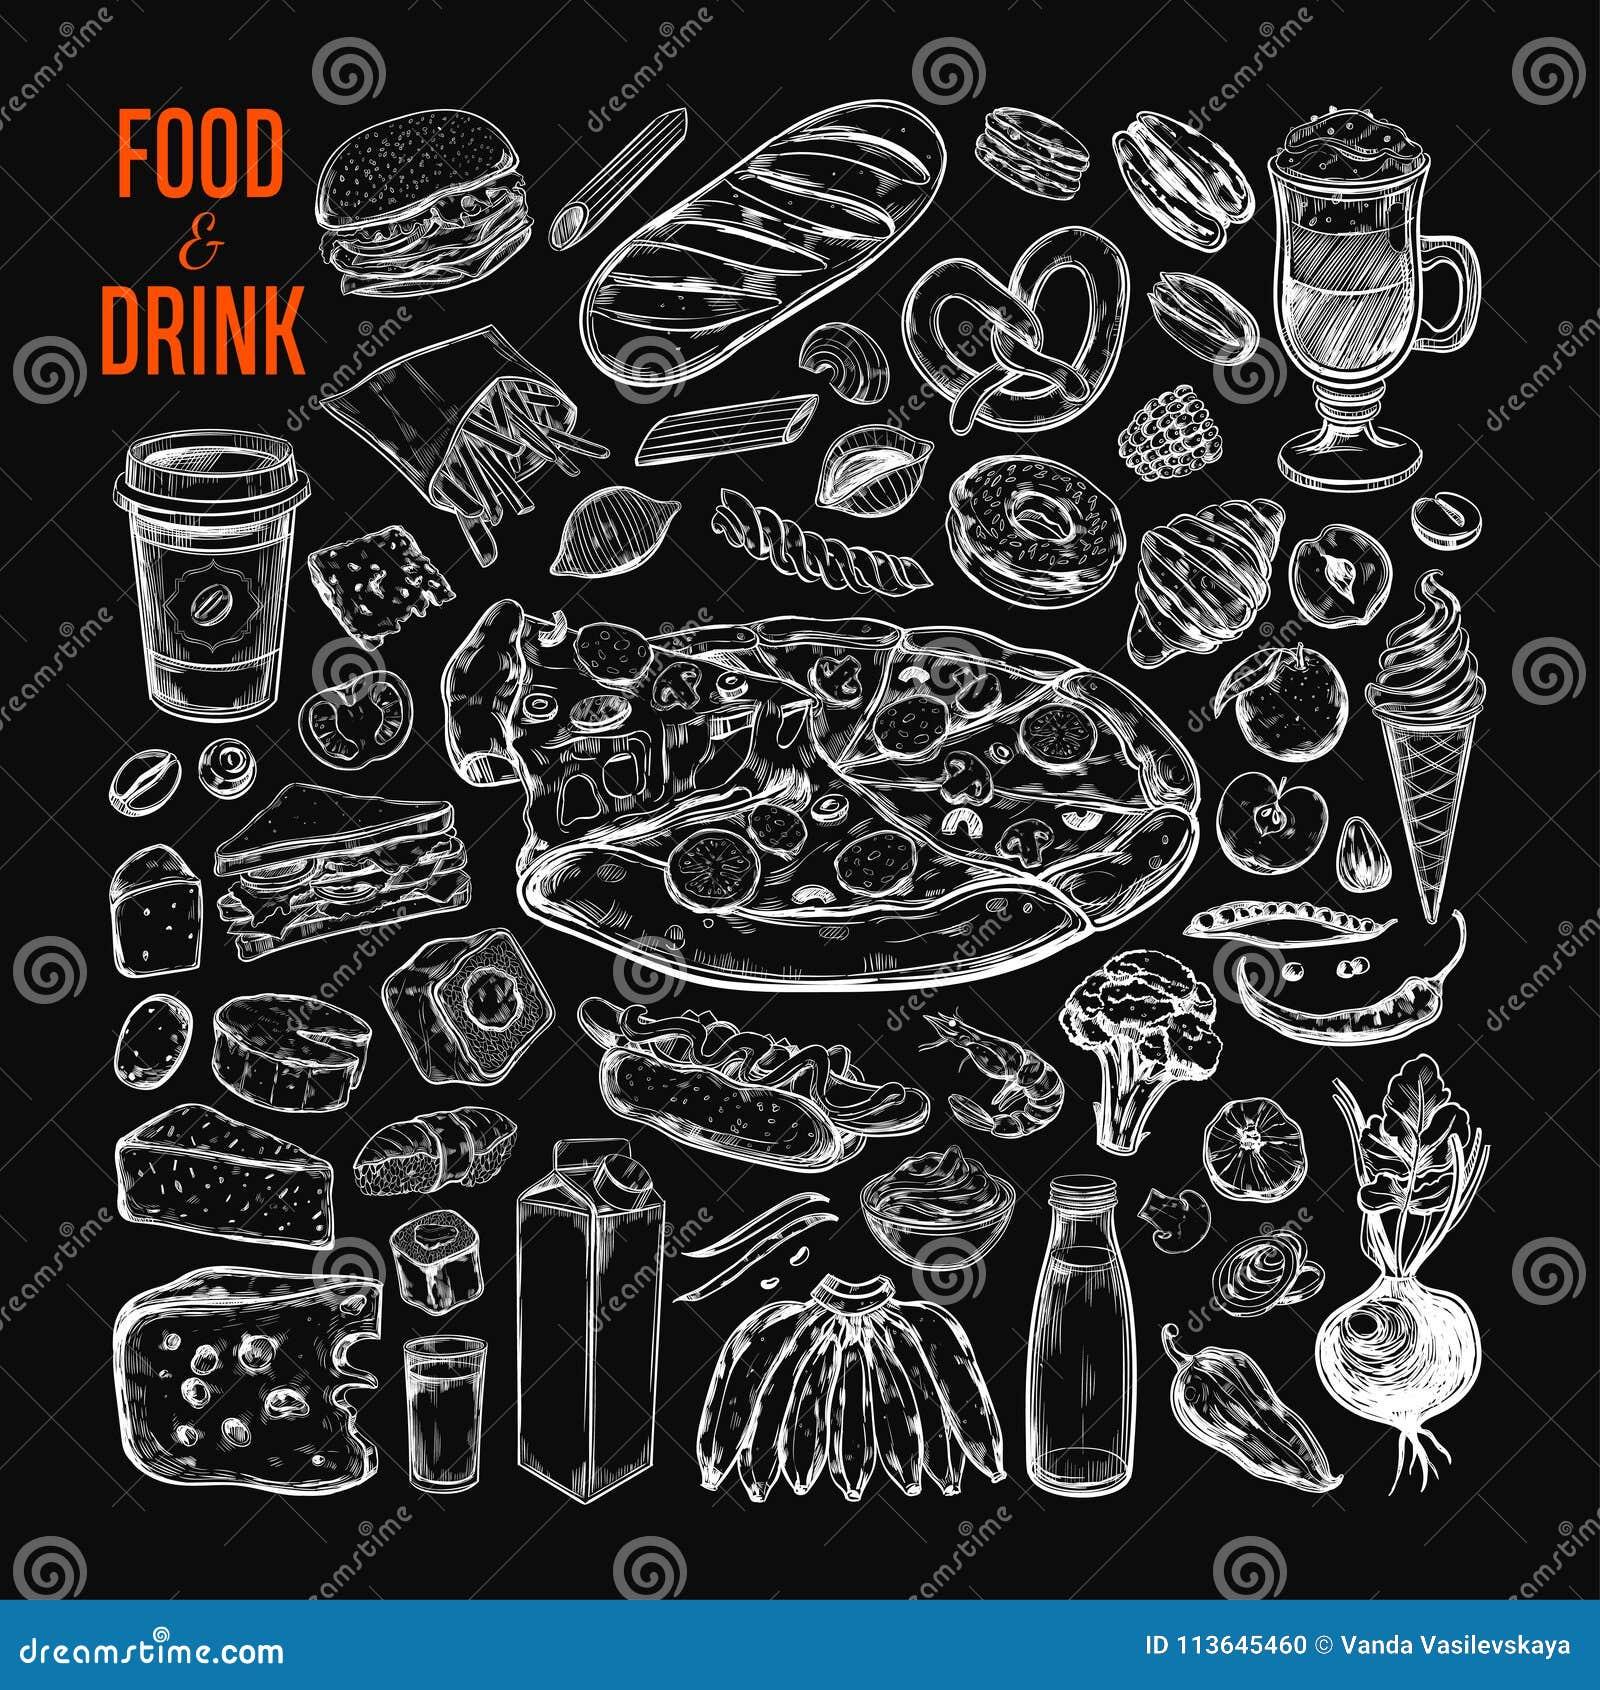 Food and Drink vector big set